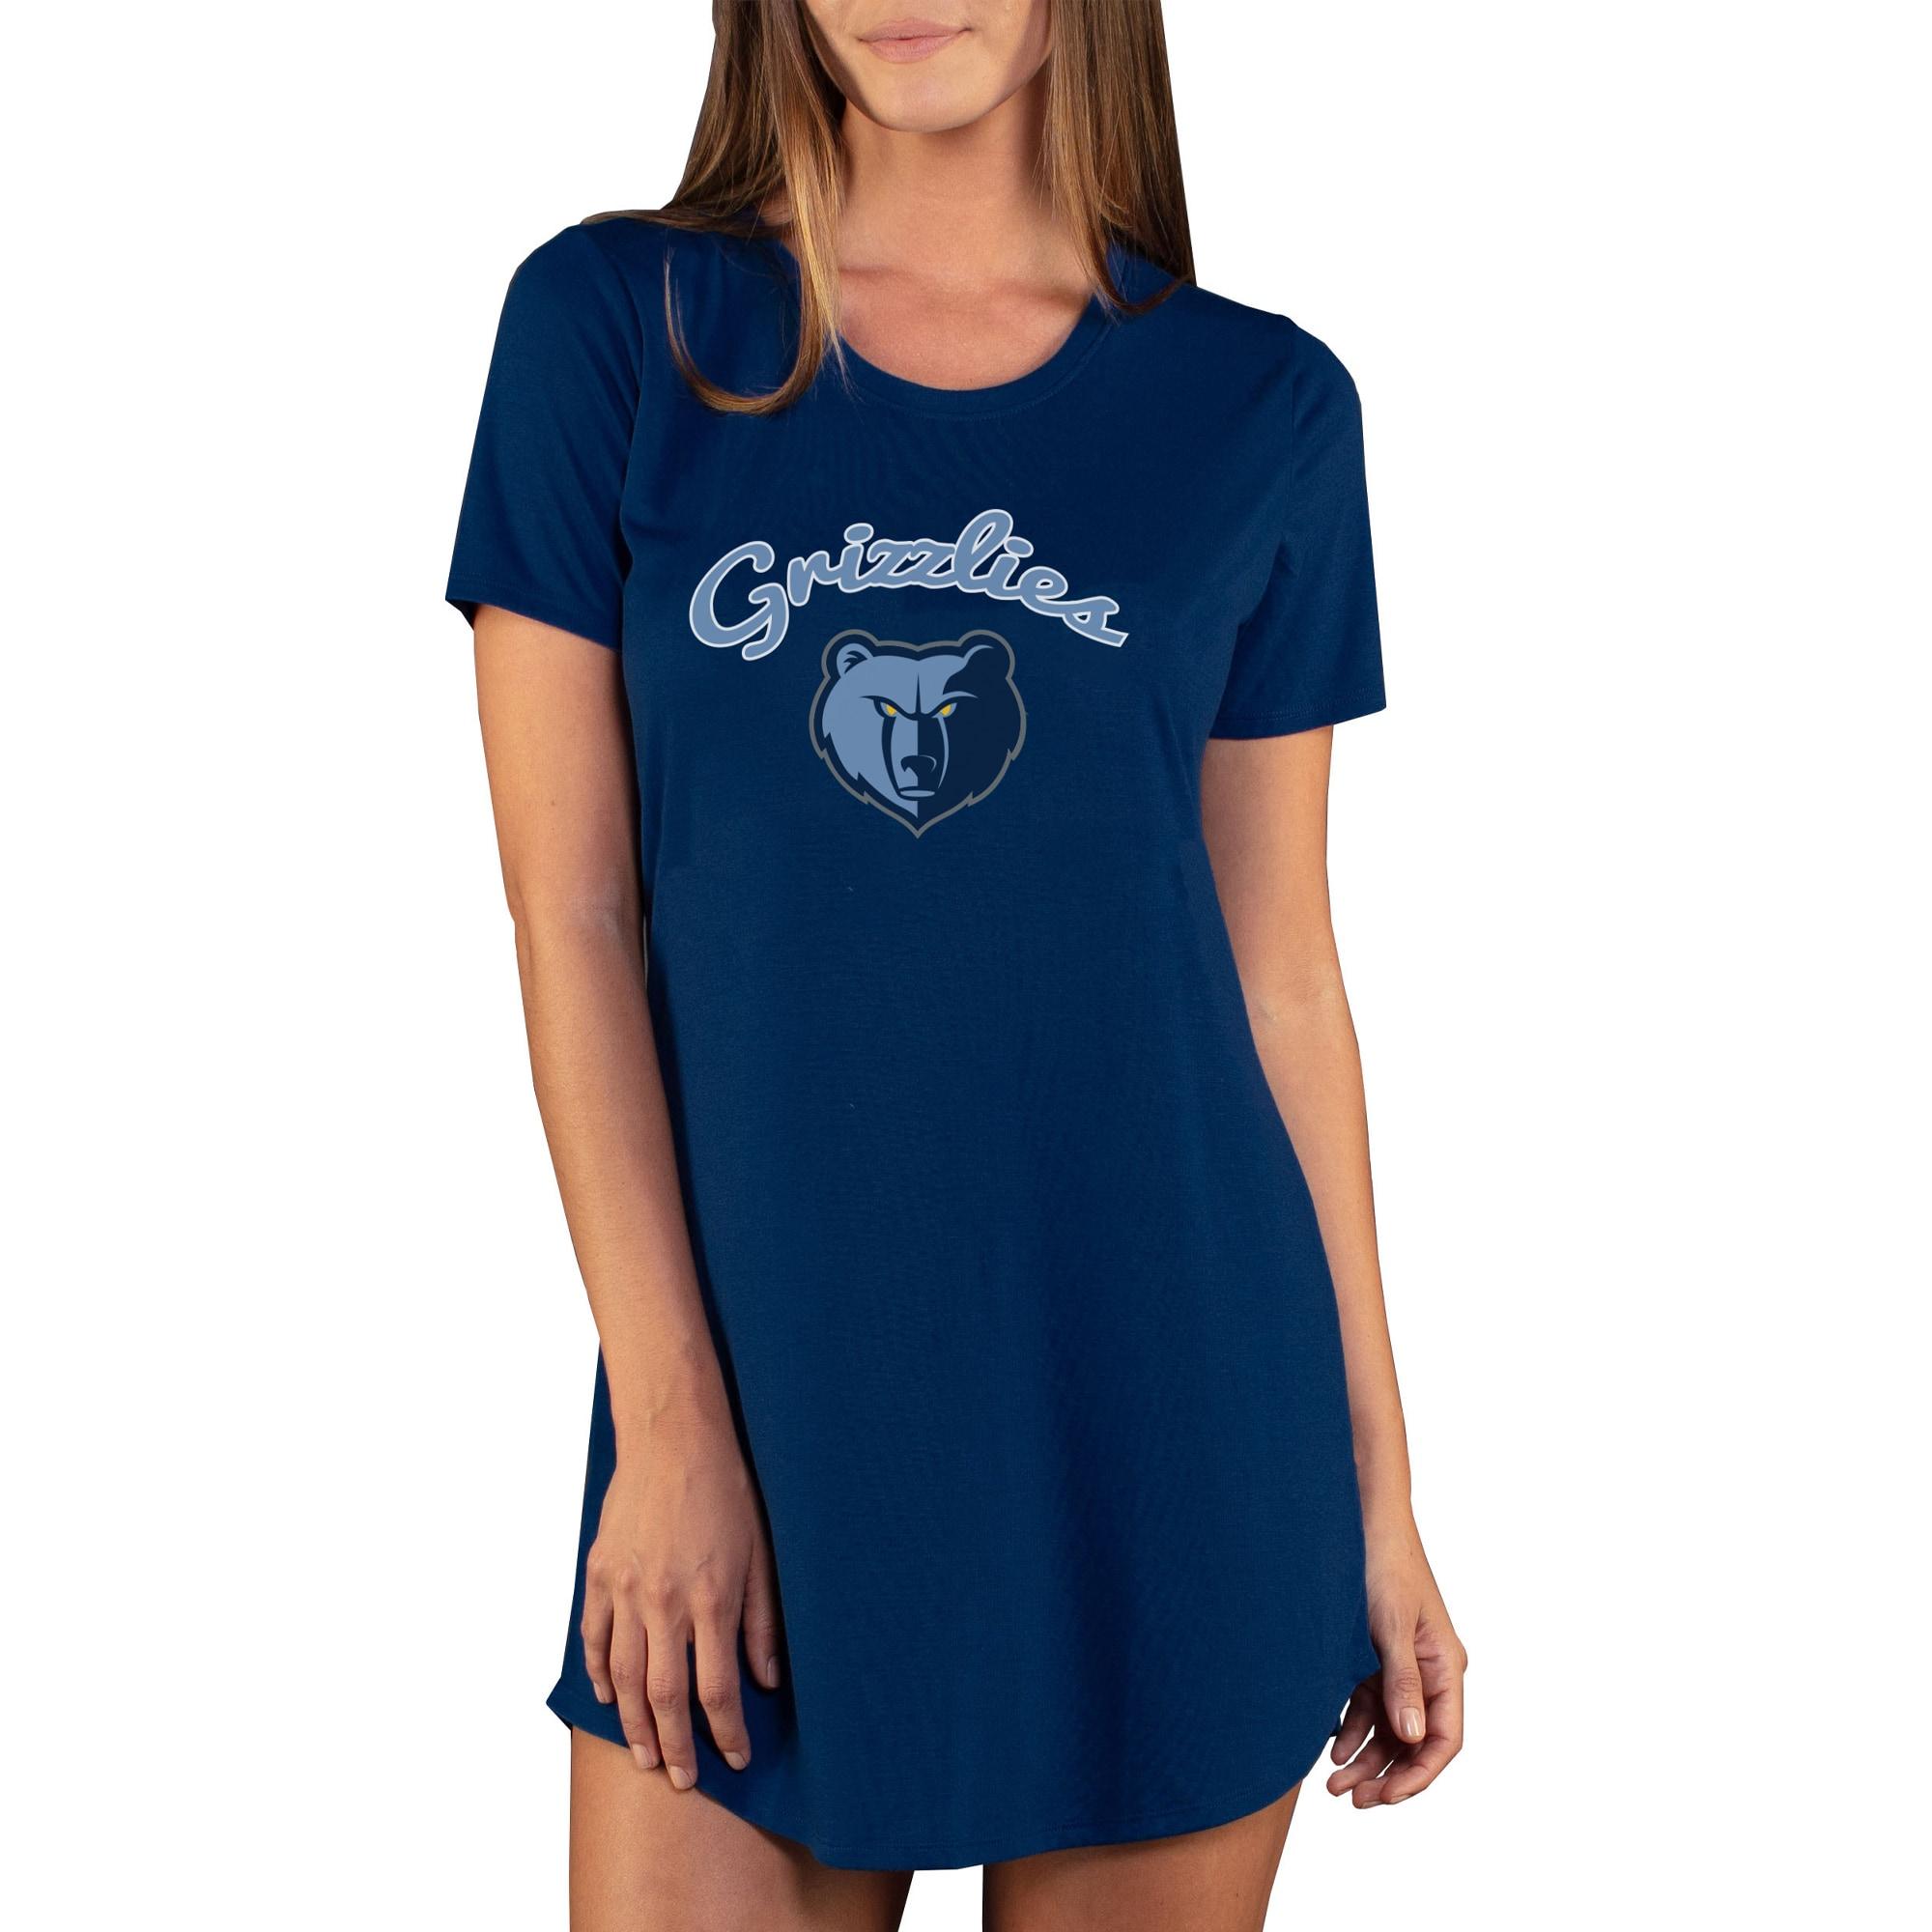 Memphis Grizzlies Concepts Sport Women's Marathon Knit Nightshirt - Navy